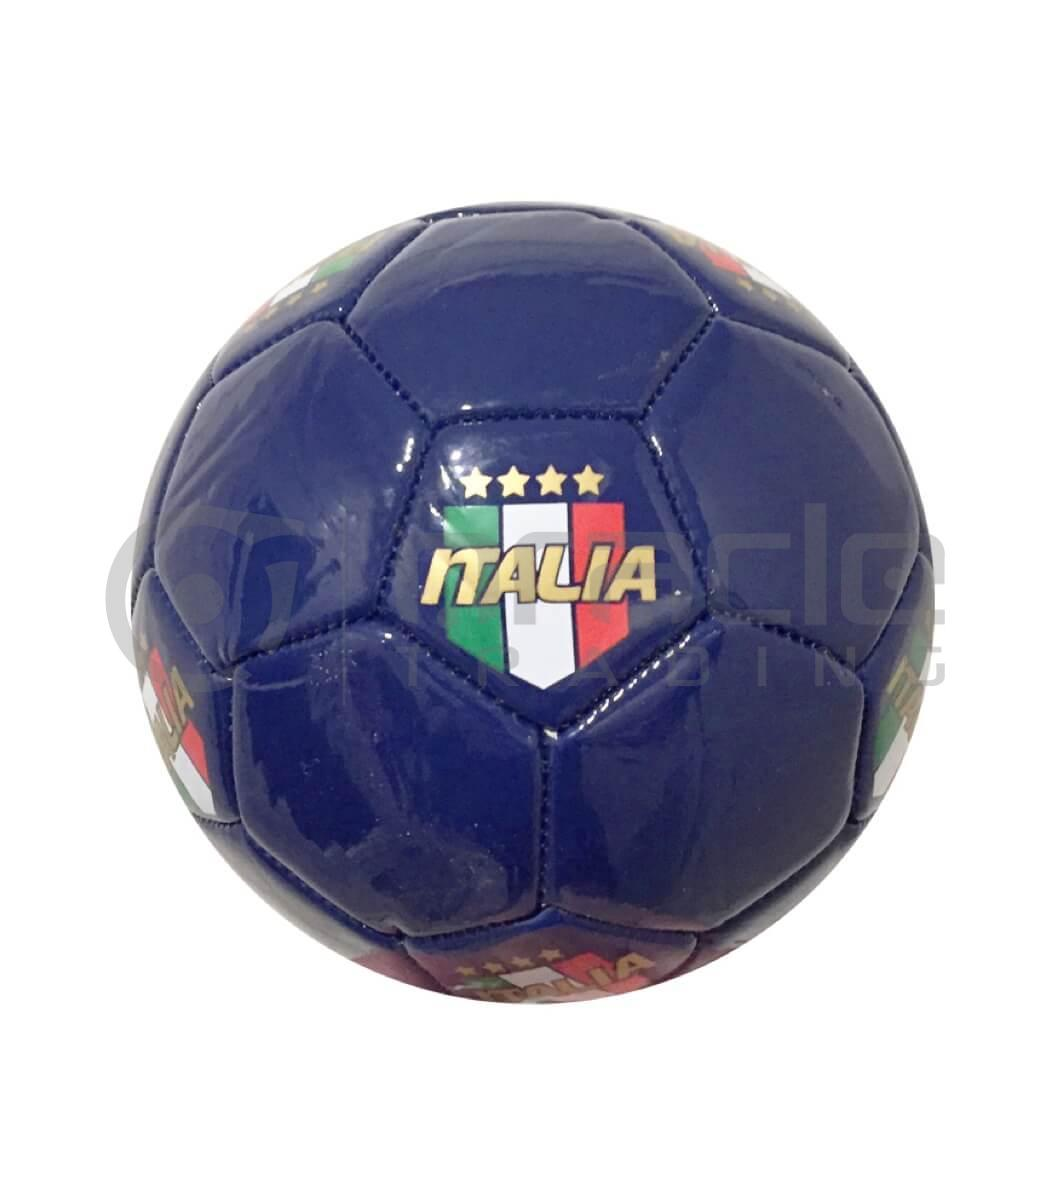 Italia Small Soccer Ball - Blue